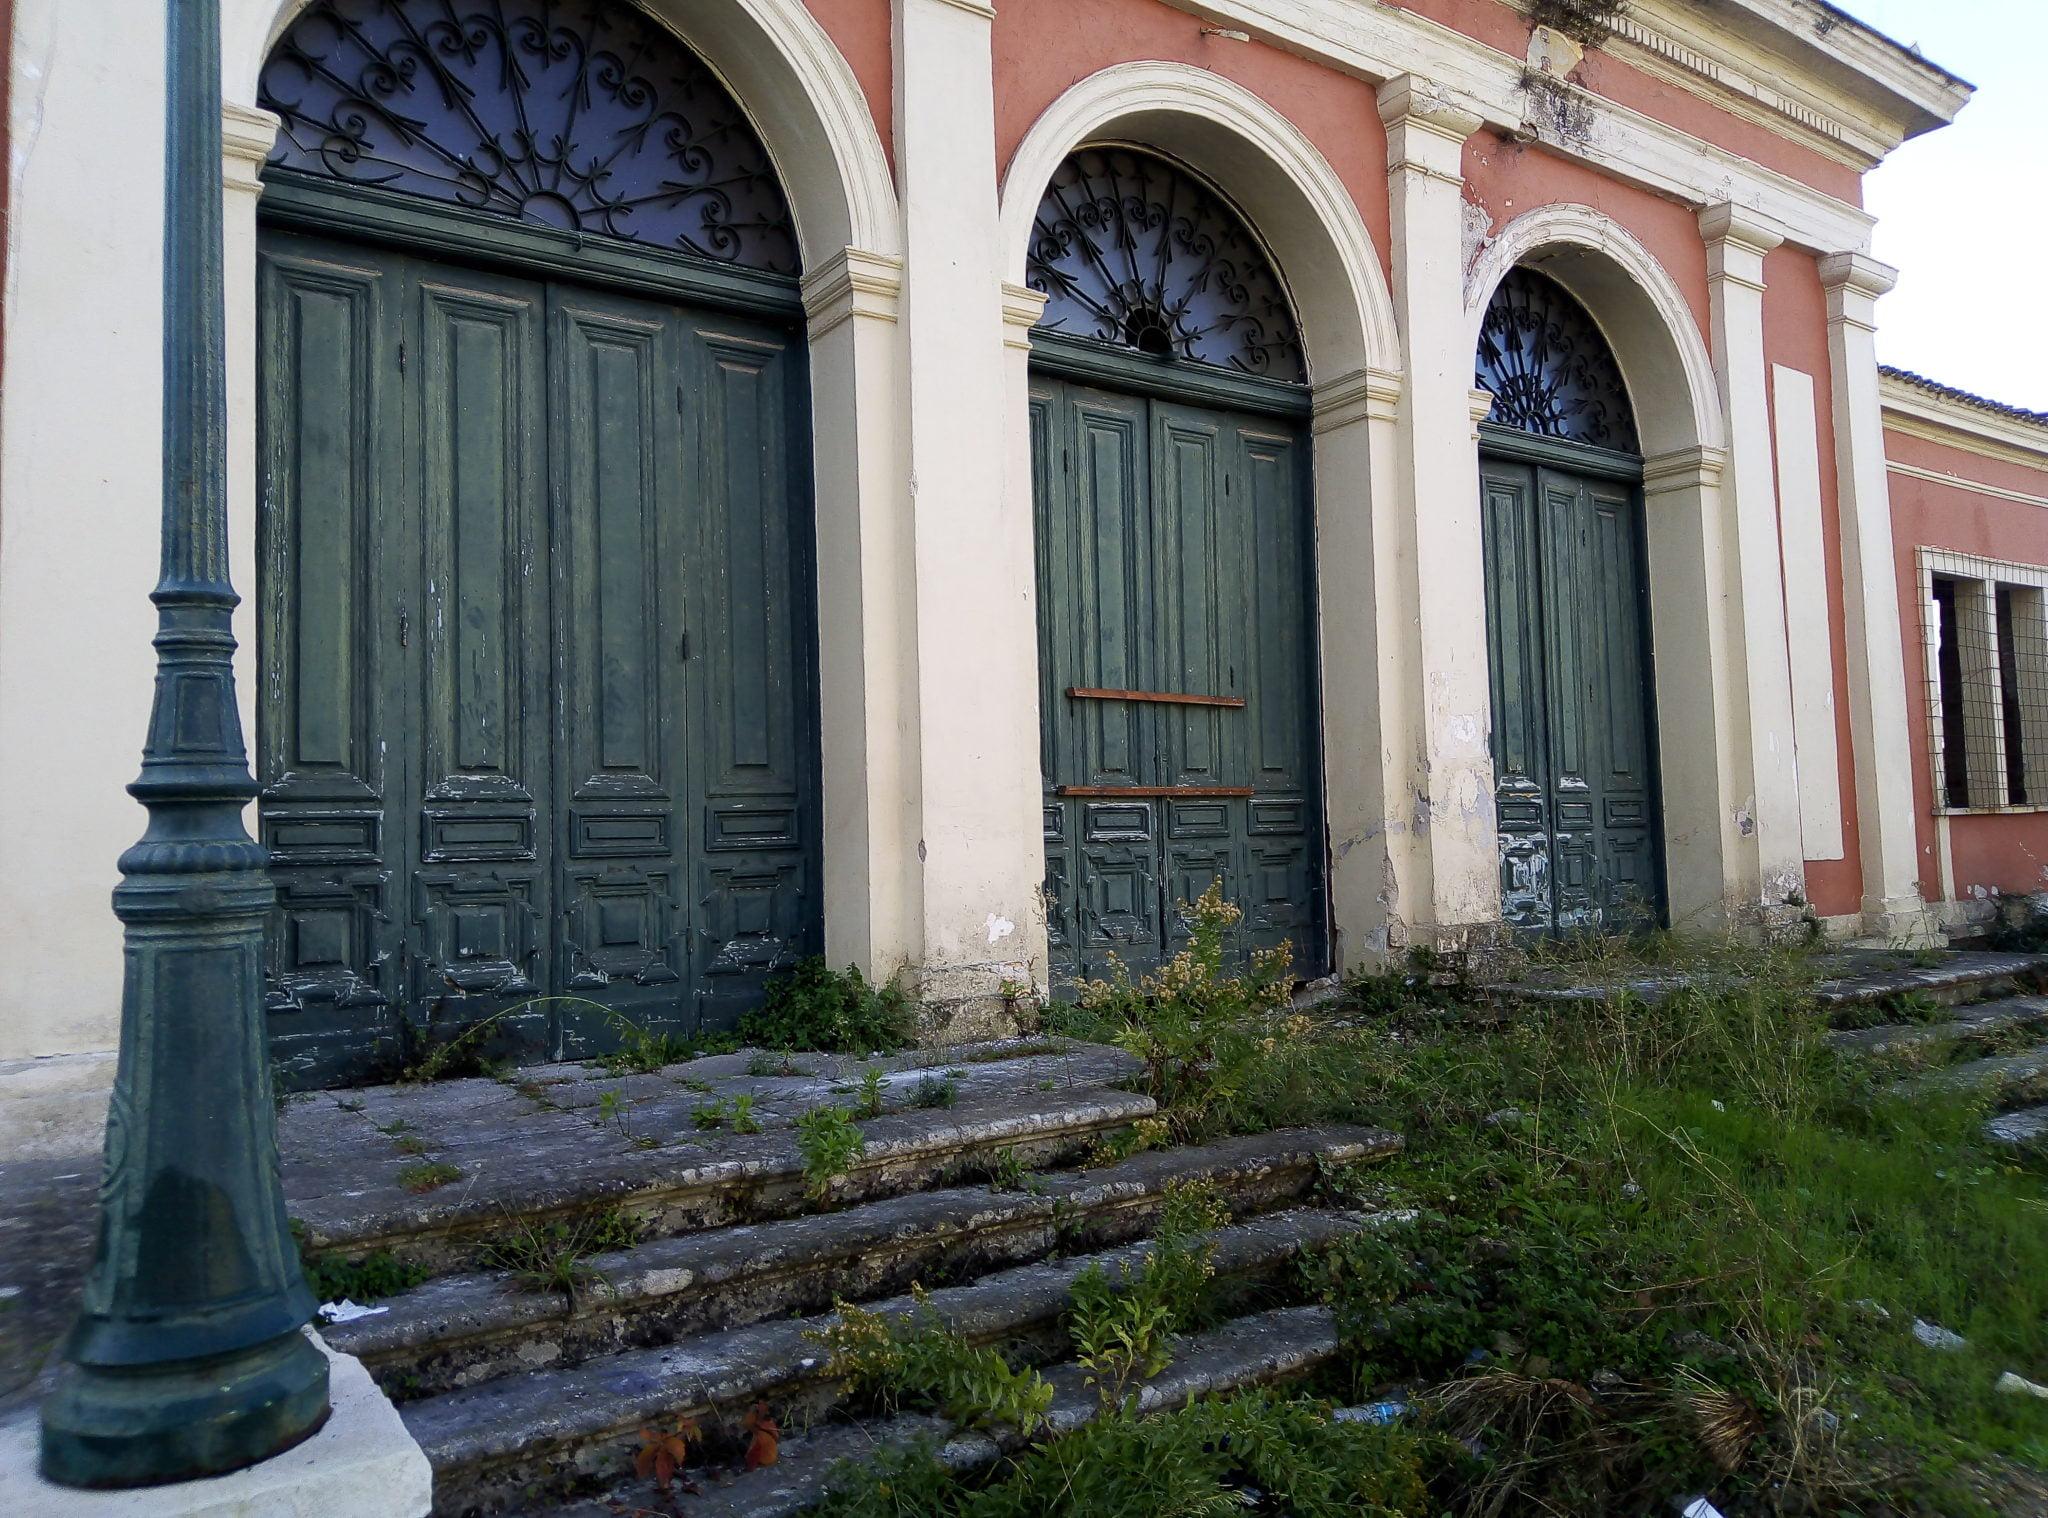 Photo of Εγκατελειψαν και το θέατρο Φοίνικας…Το παλιό θερινό σινεμά έγινε σπίτι αστεγων!!!! Μπράβο Δήμαρχε Νικολούζο